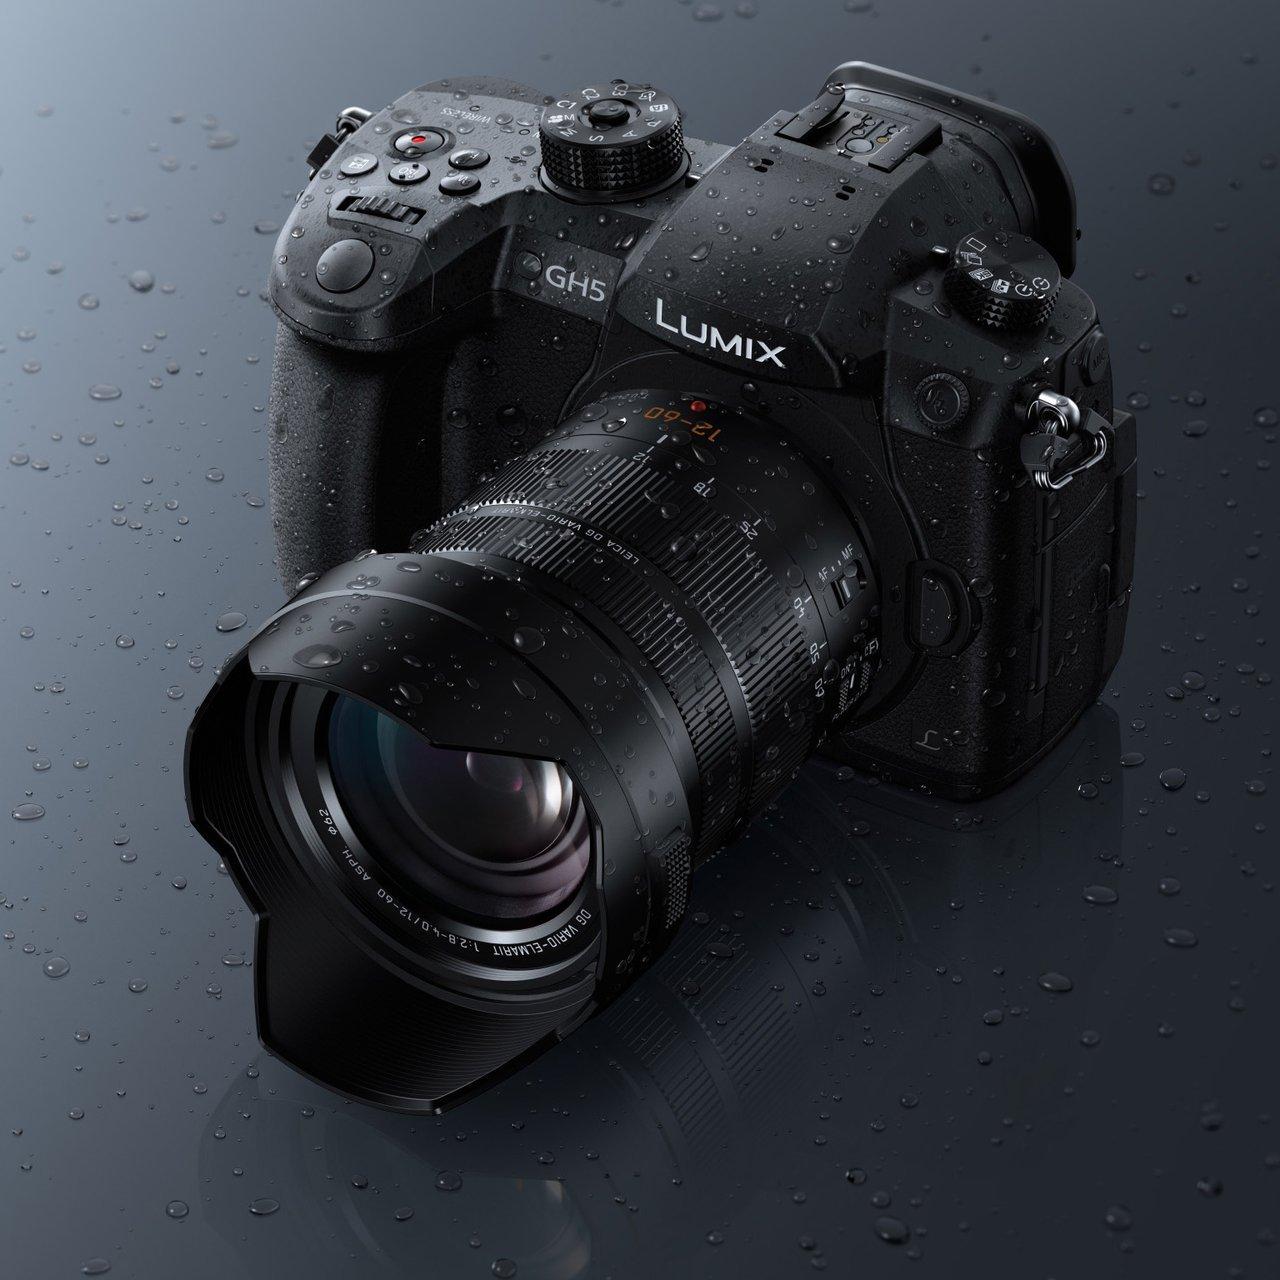 Panasonic Lumix DC-GH5 Mirrorless Micro Four Thirds Digital Camera